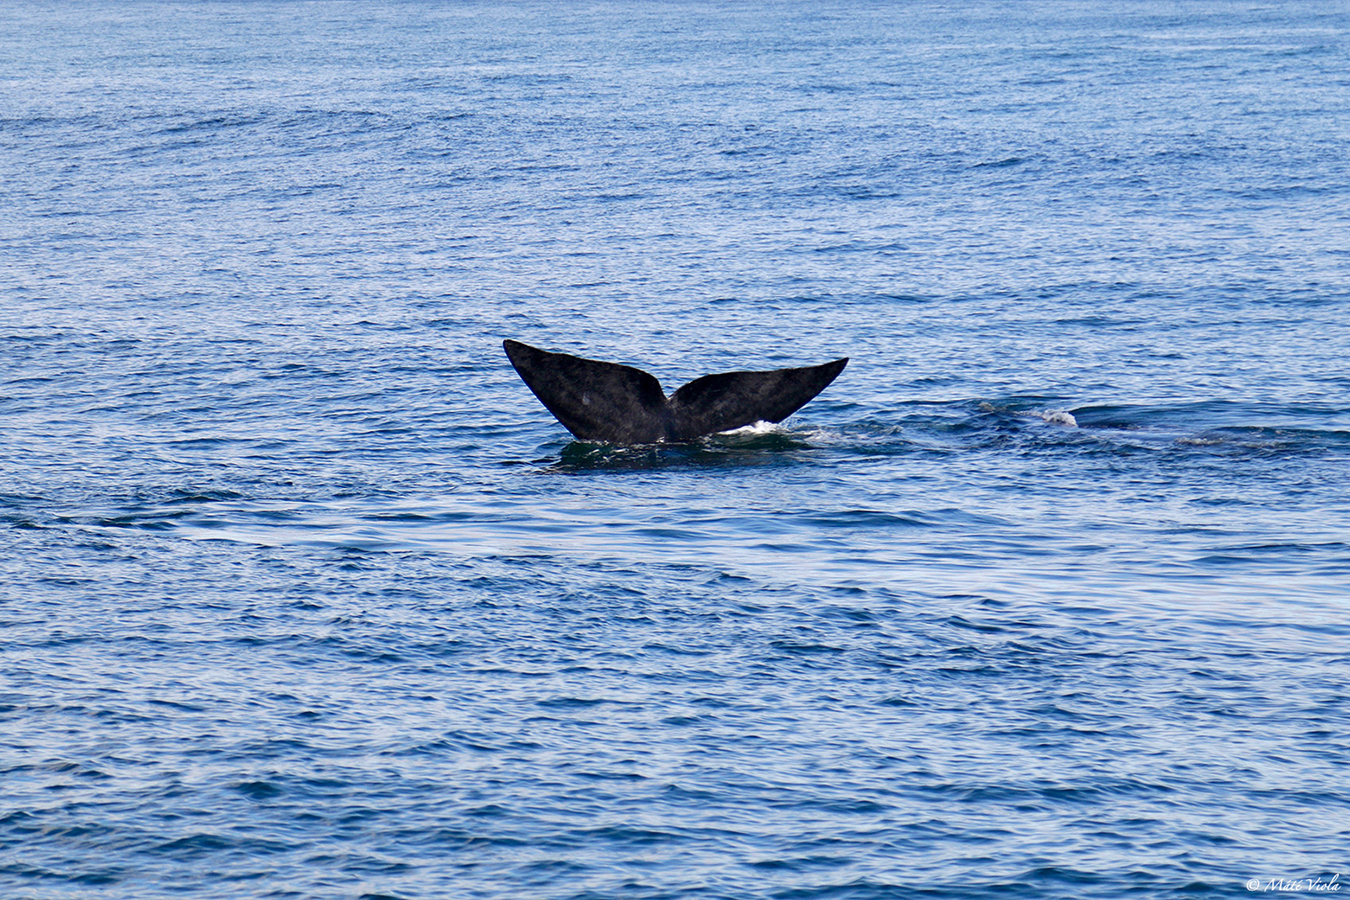 La baleine australe